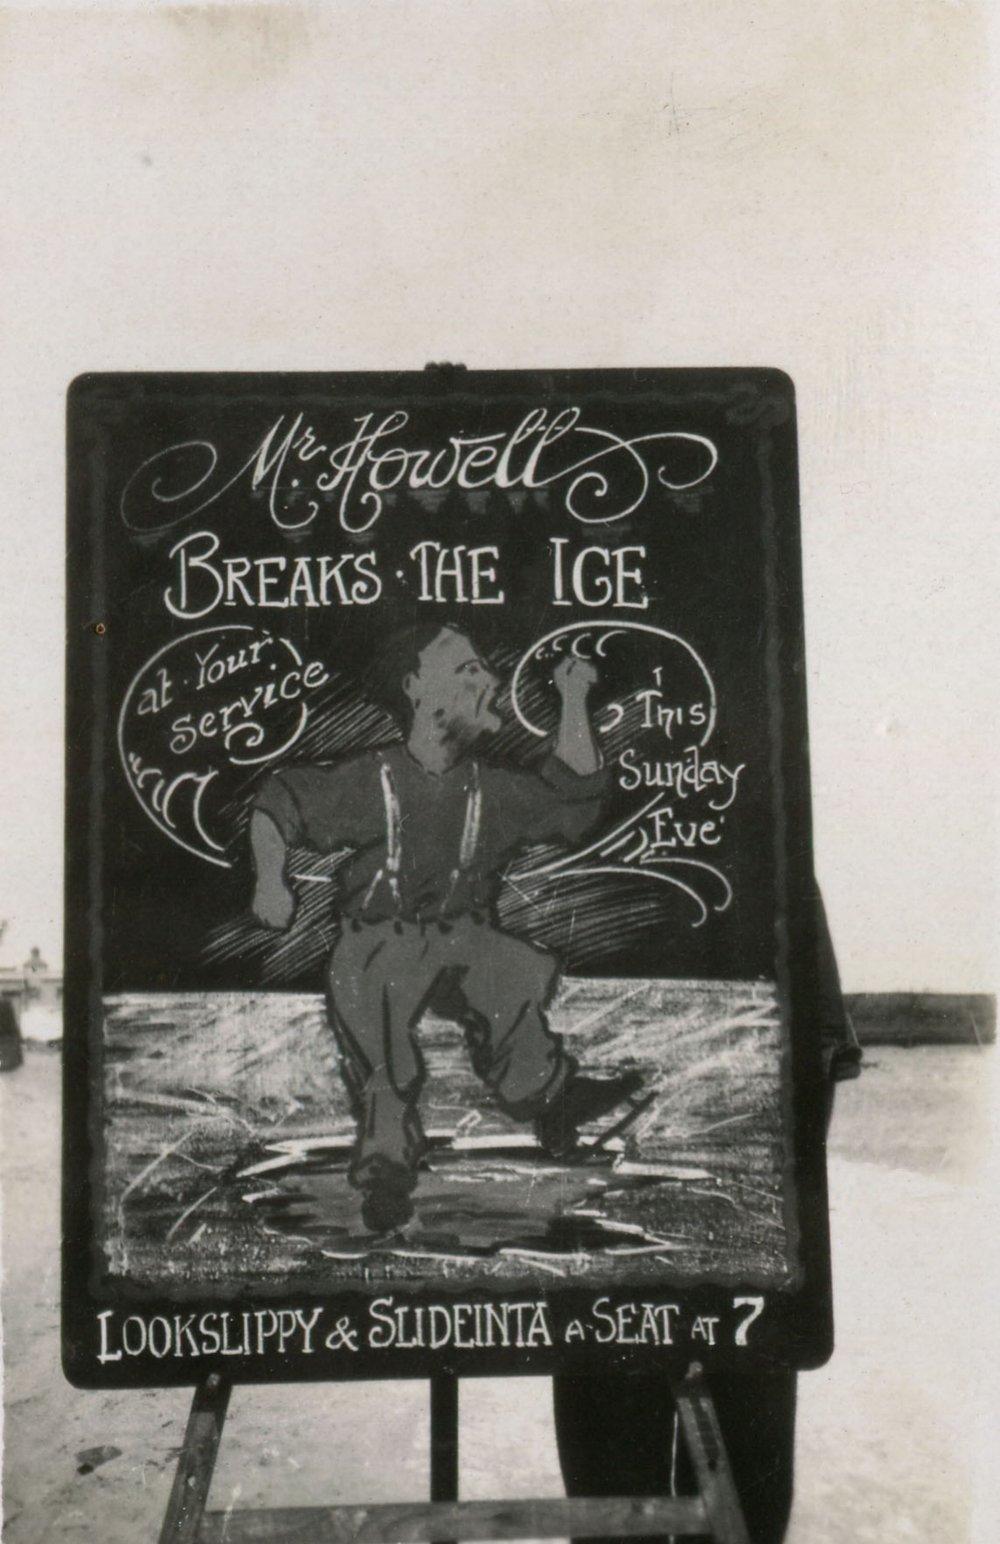 reg walters049 Mr Howell breaks the ice.jpg